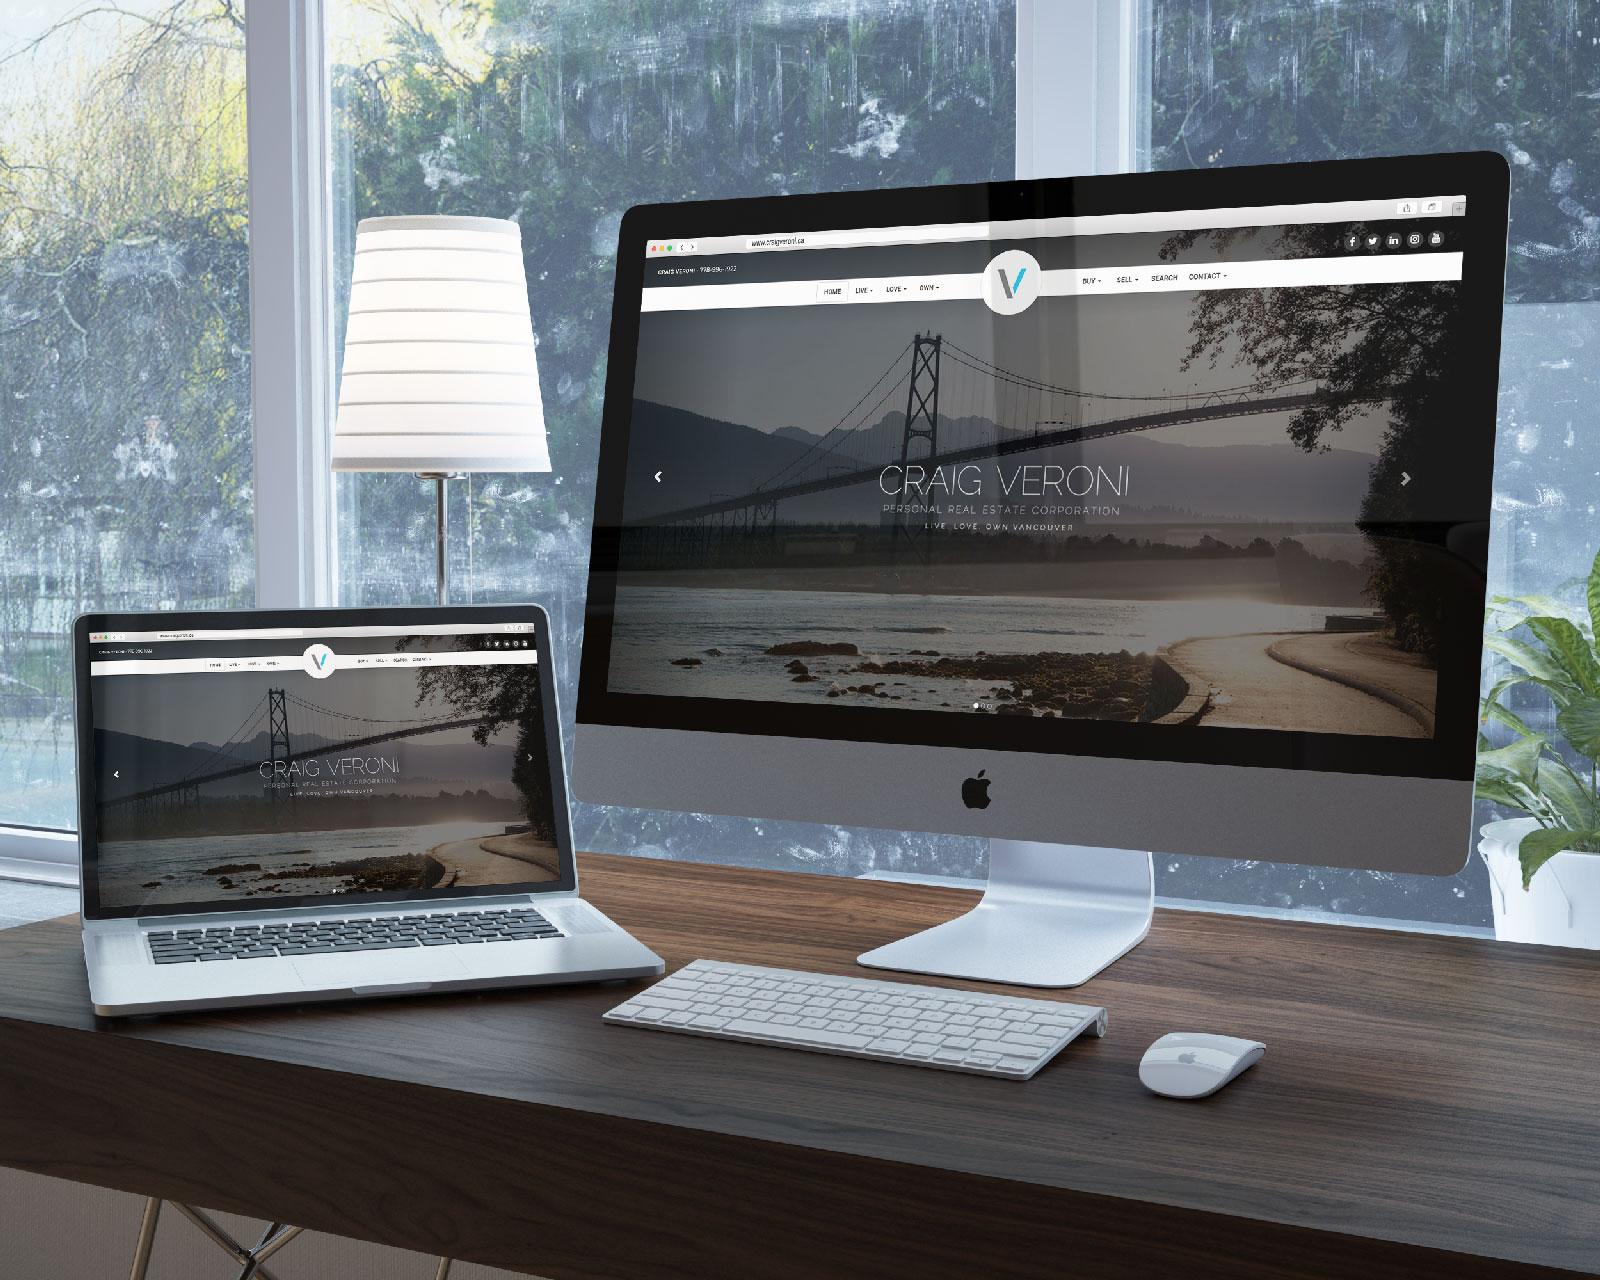 Craig Veroni's Katana Website looks awesome on any device